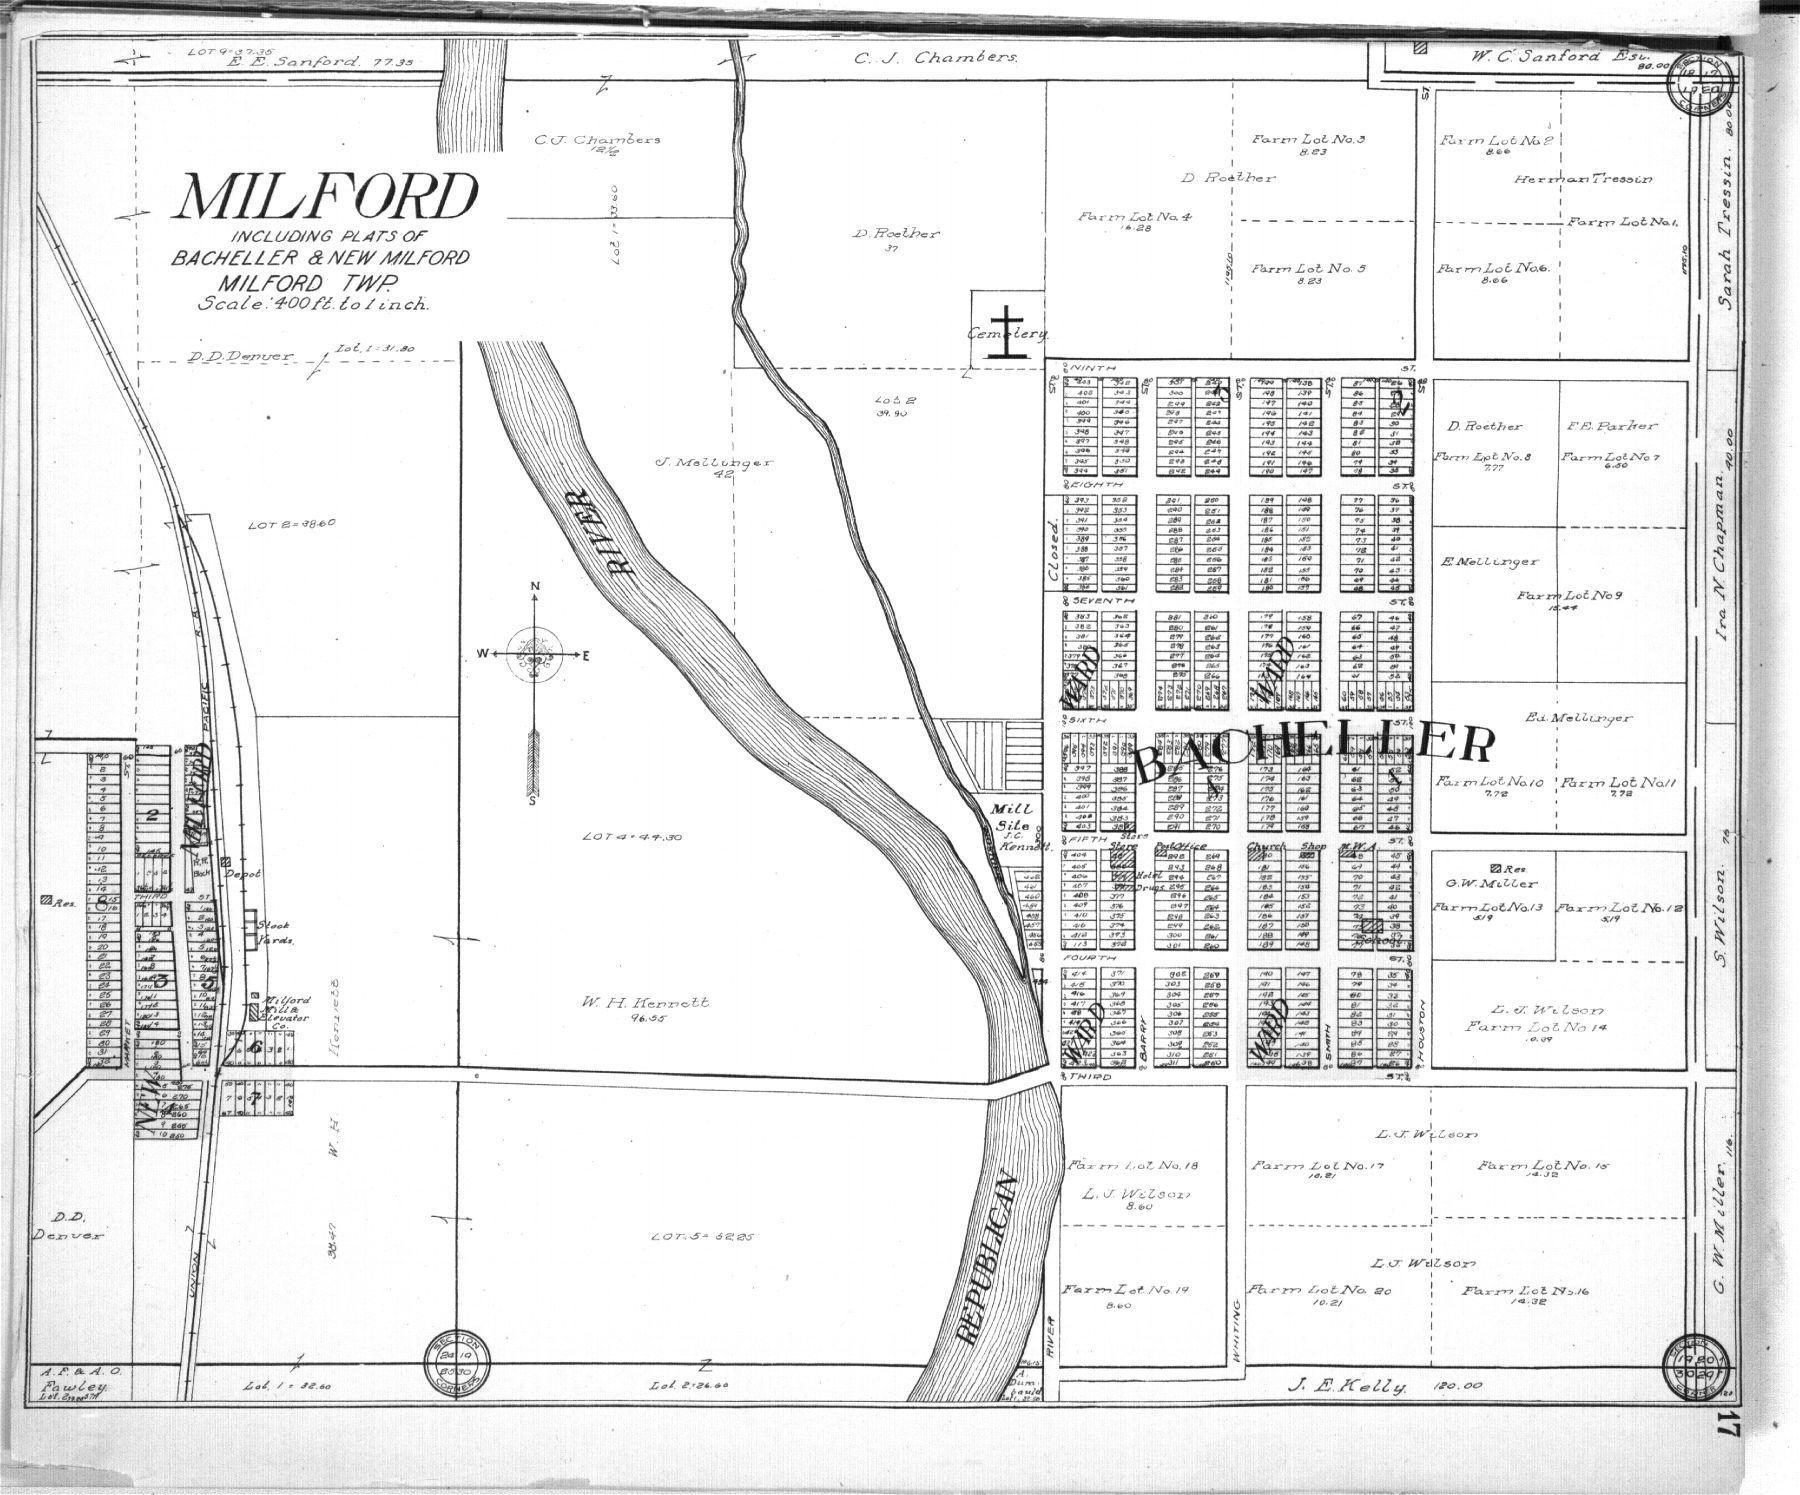 Standard atlas of Geary County, Kansas - 17